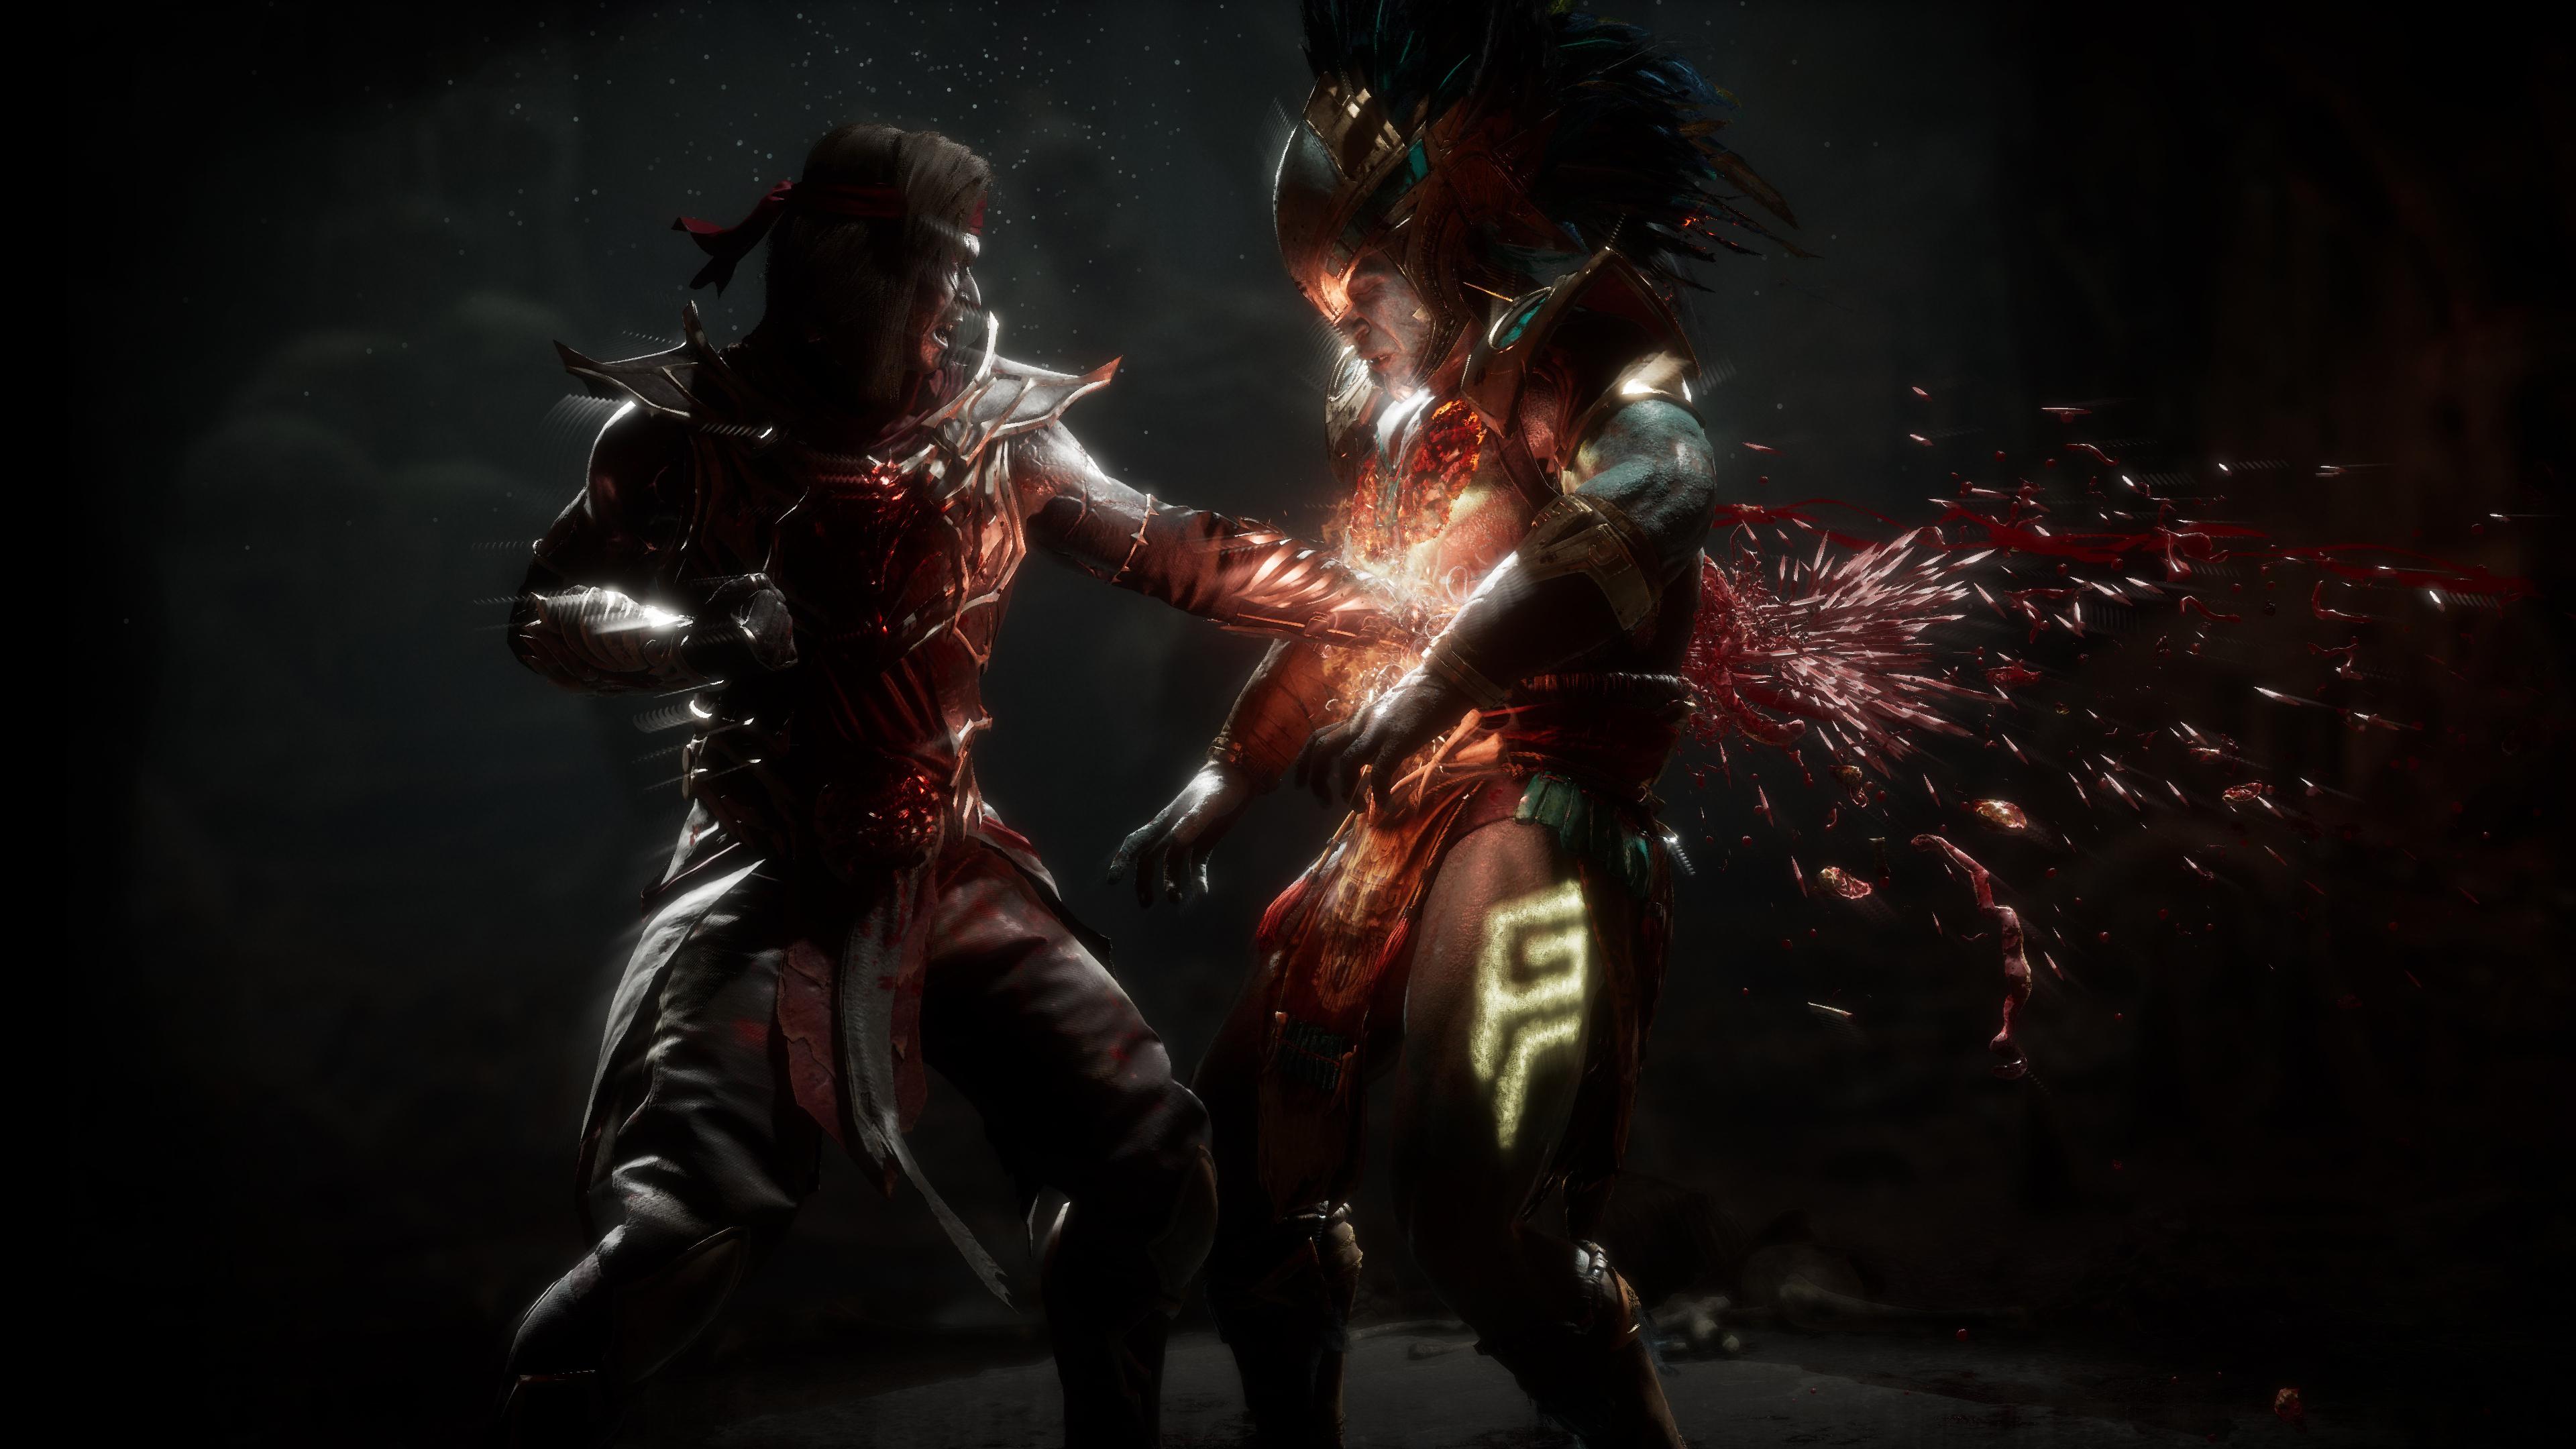 3840x2160 Mortal Kombat 11 Gameplay 4k Wallpaper Hd Games 4k